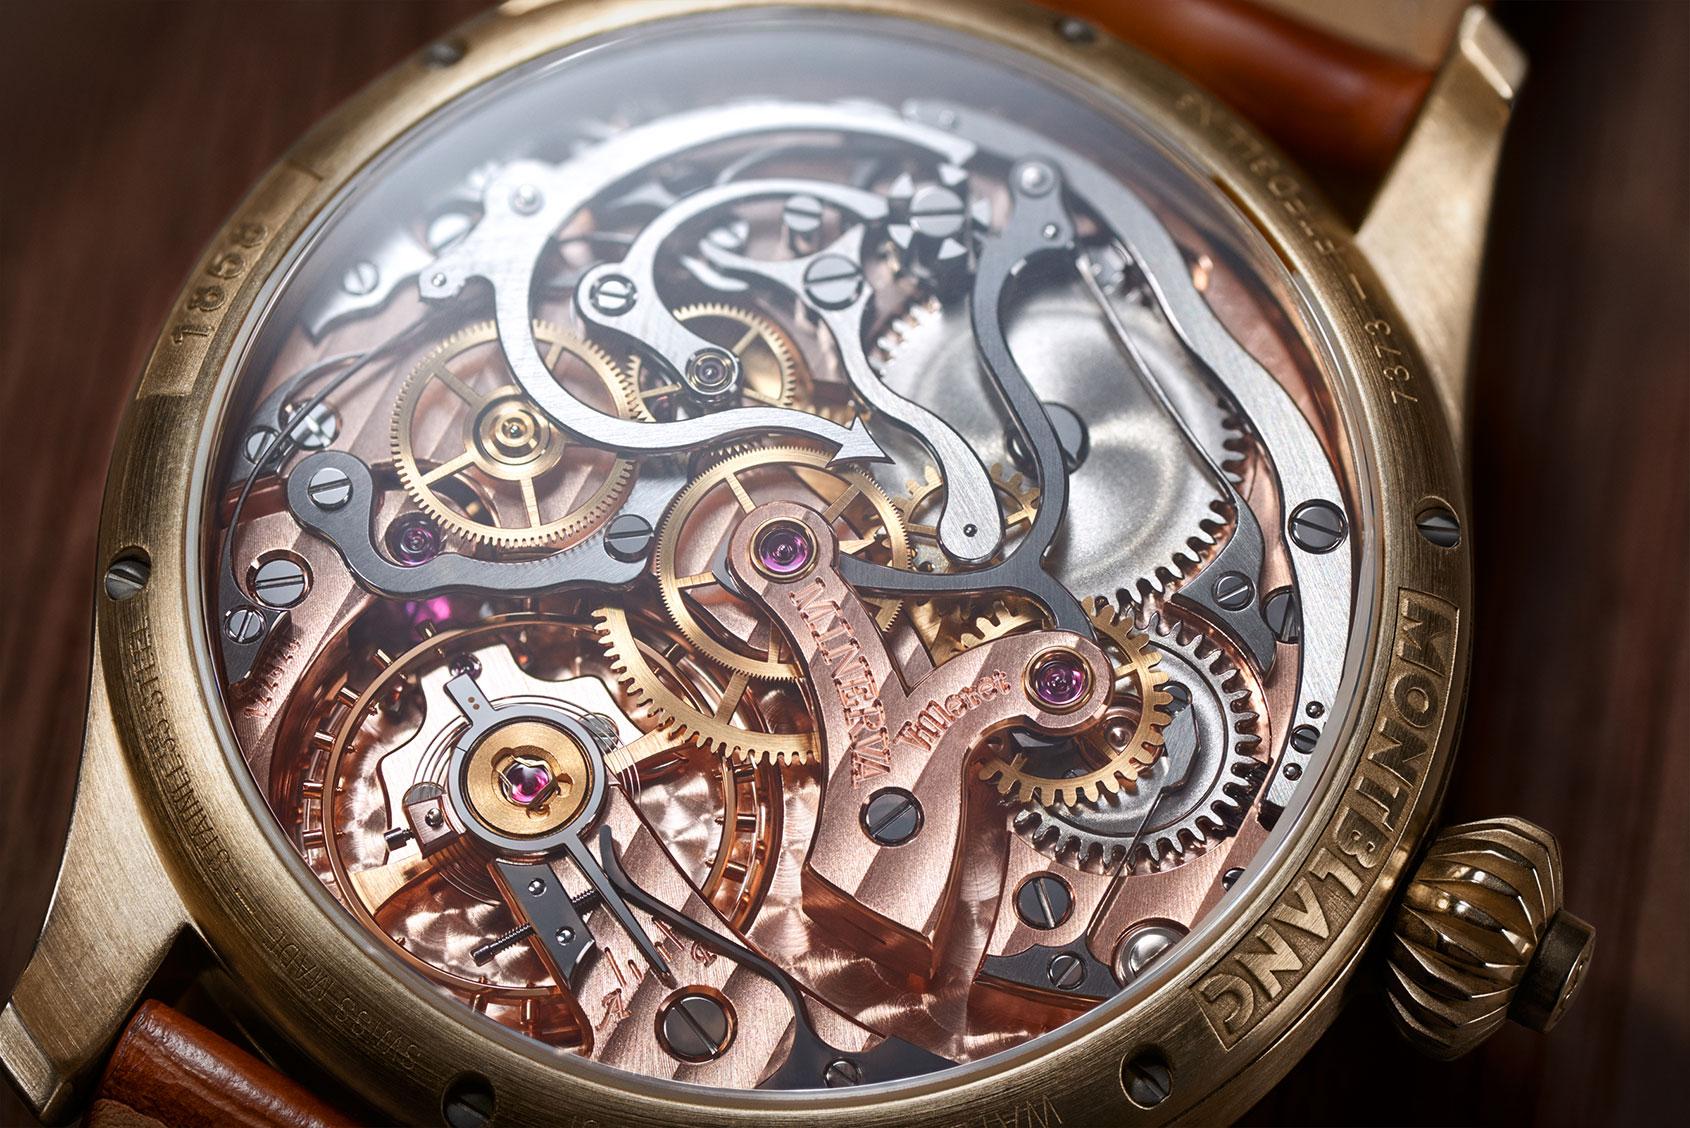 Montblanc-1858-tachymetre-chronograph-bronze-1